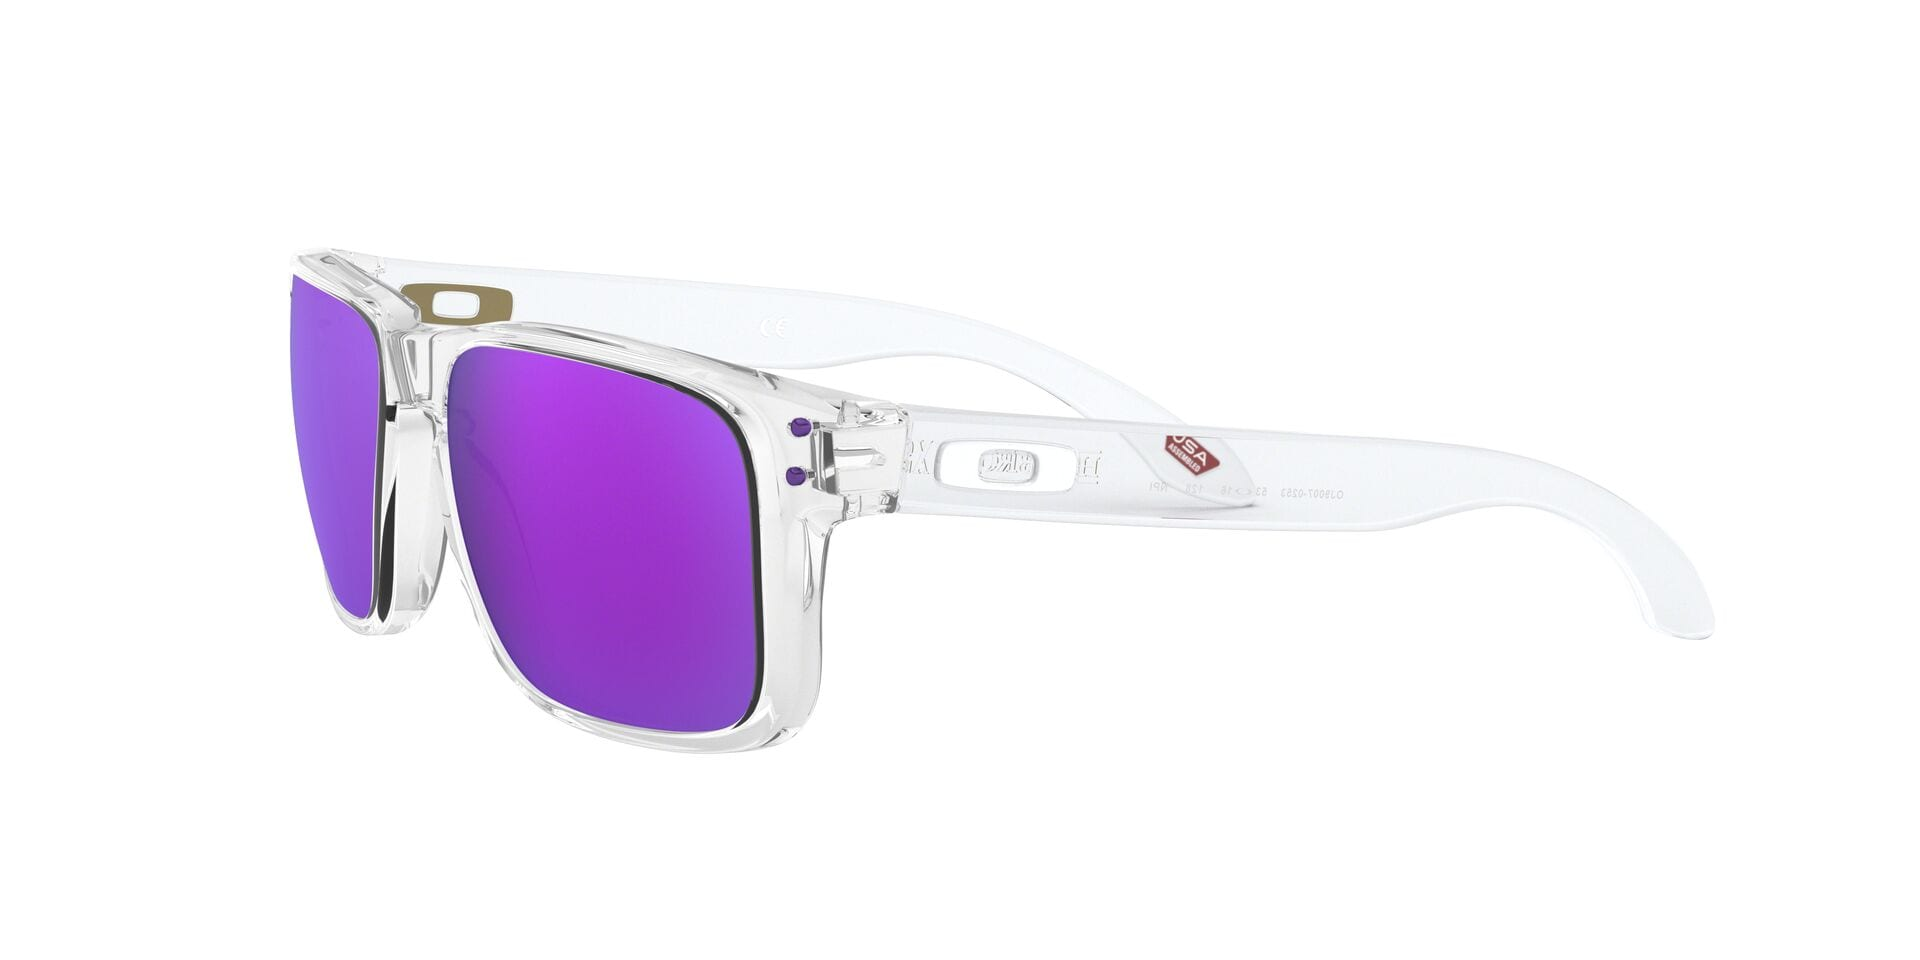 731f5e8eb6a2 Oakley Holbrook XS Sunglasses - ADS Lifestyle